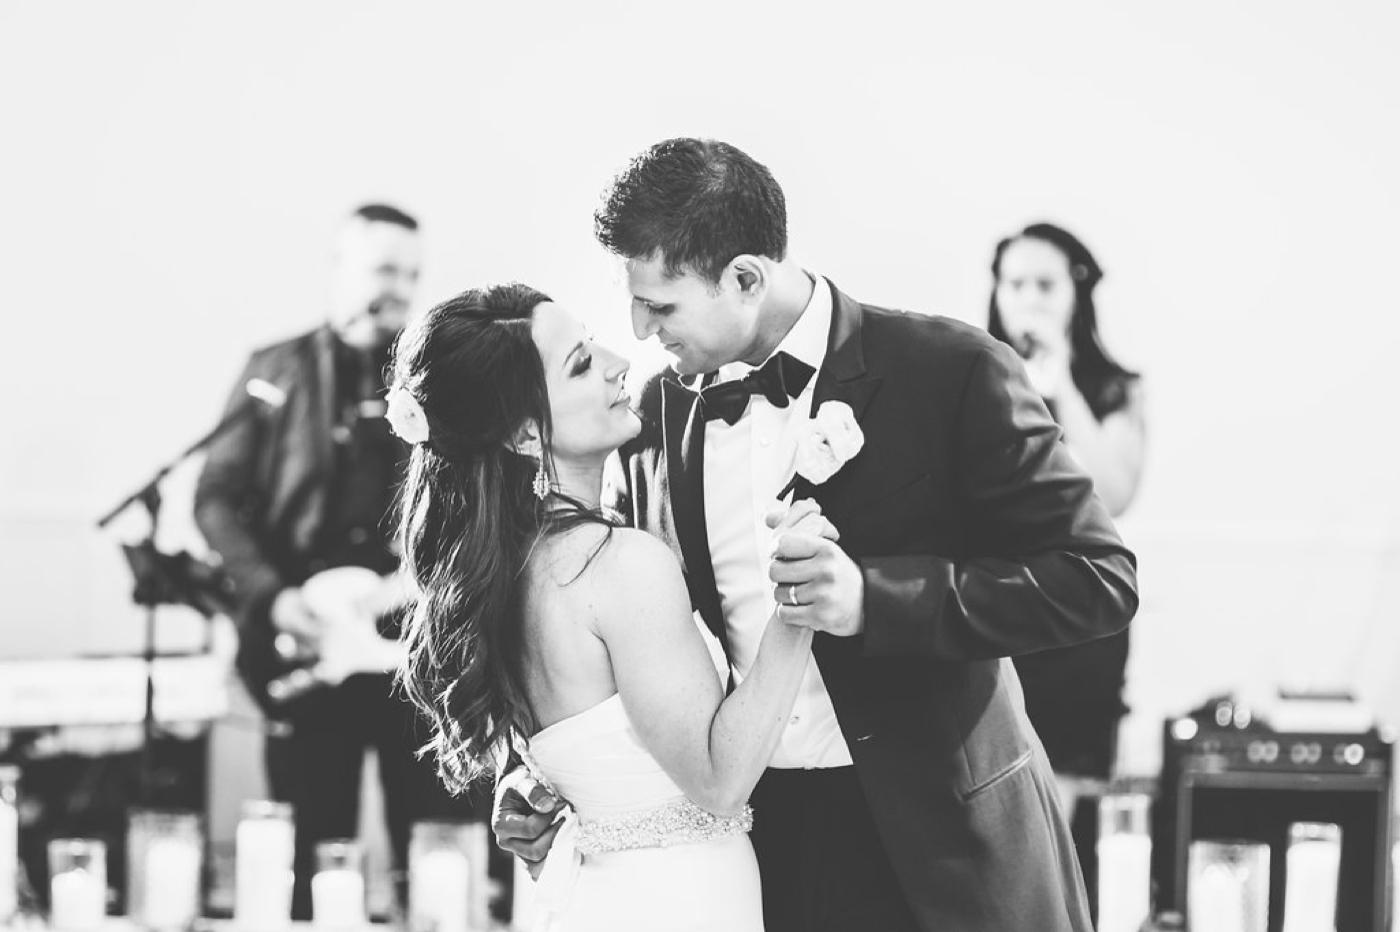 chicago-fine-art-wedding-photography-sakamuri91